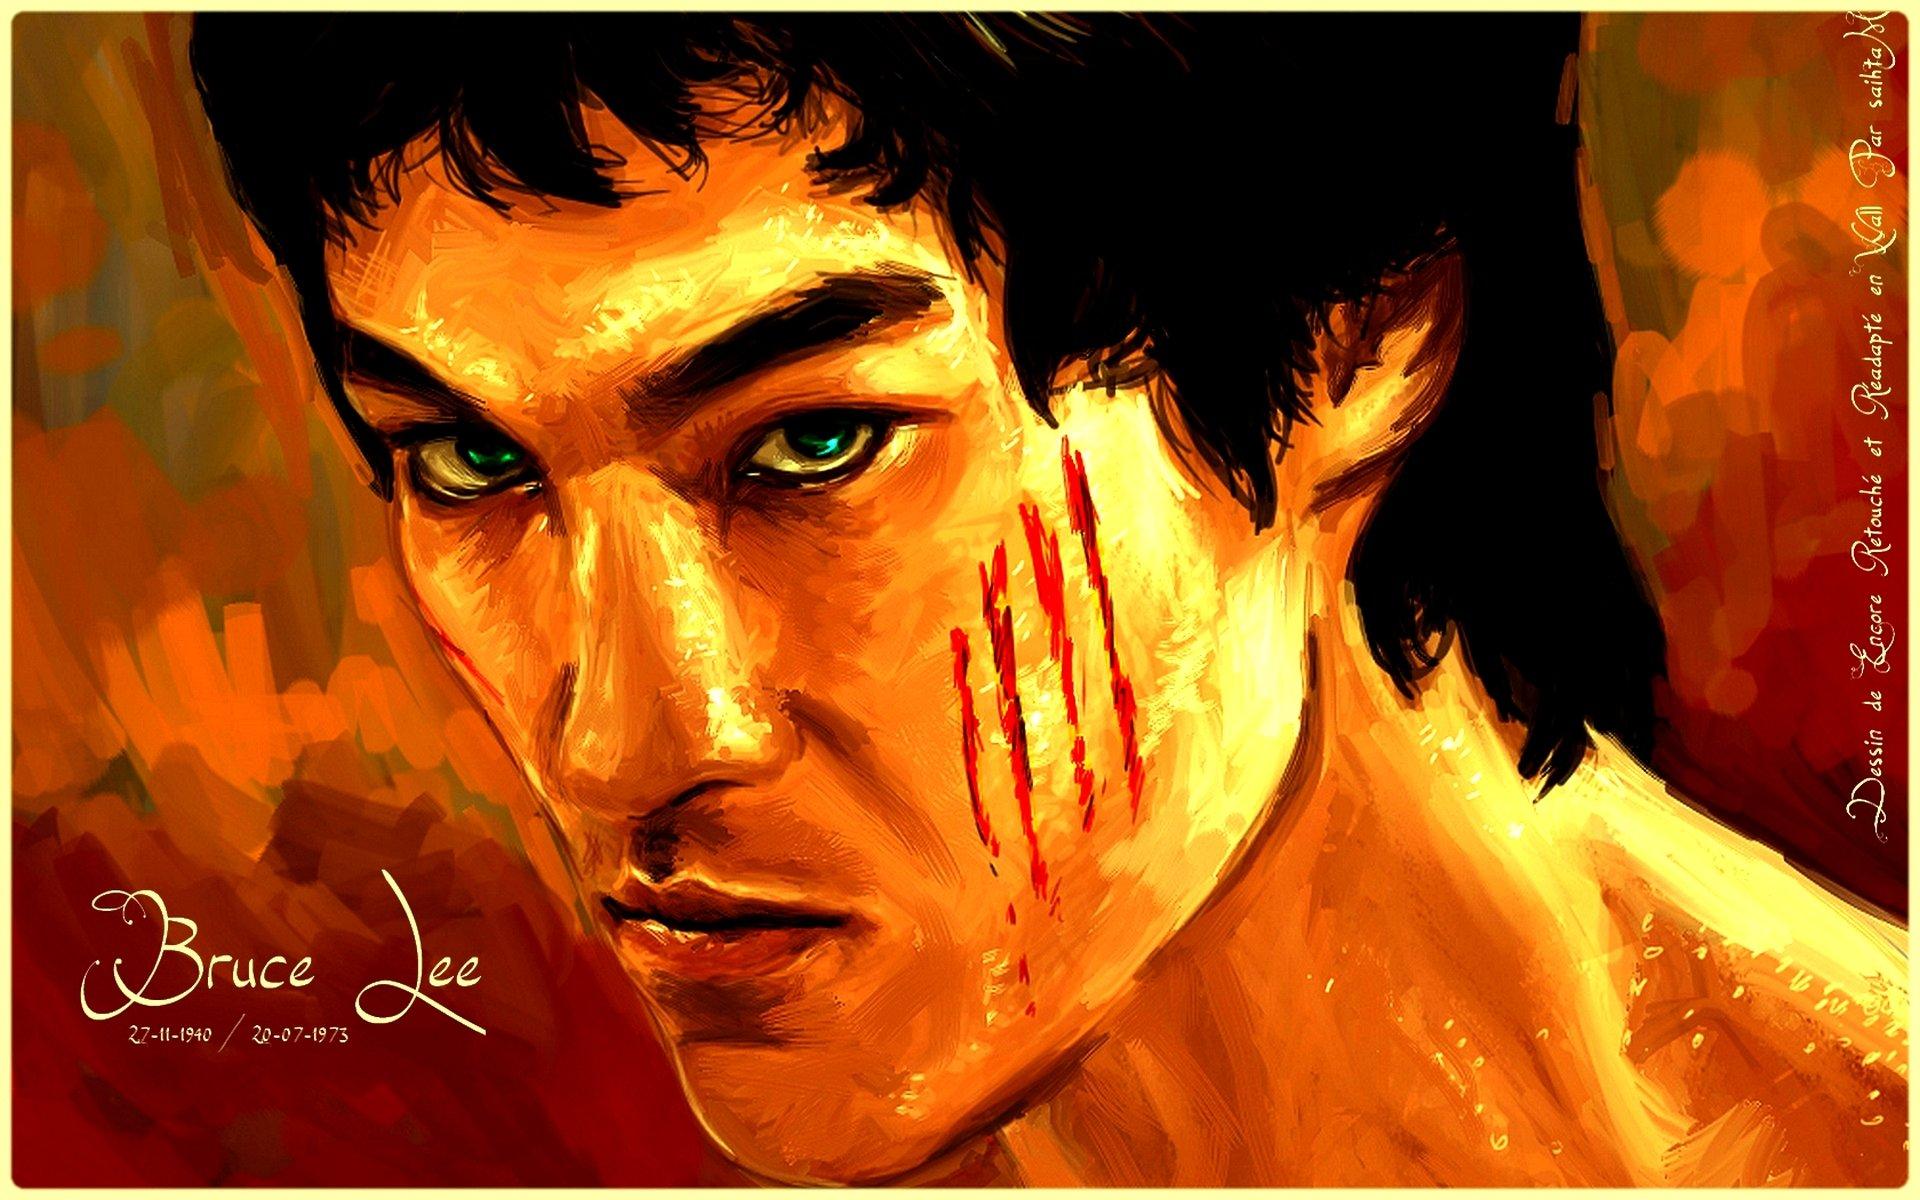 Bruce Lee Wallpapers Hd Wallpaper